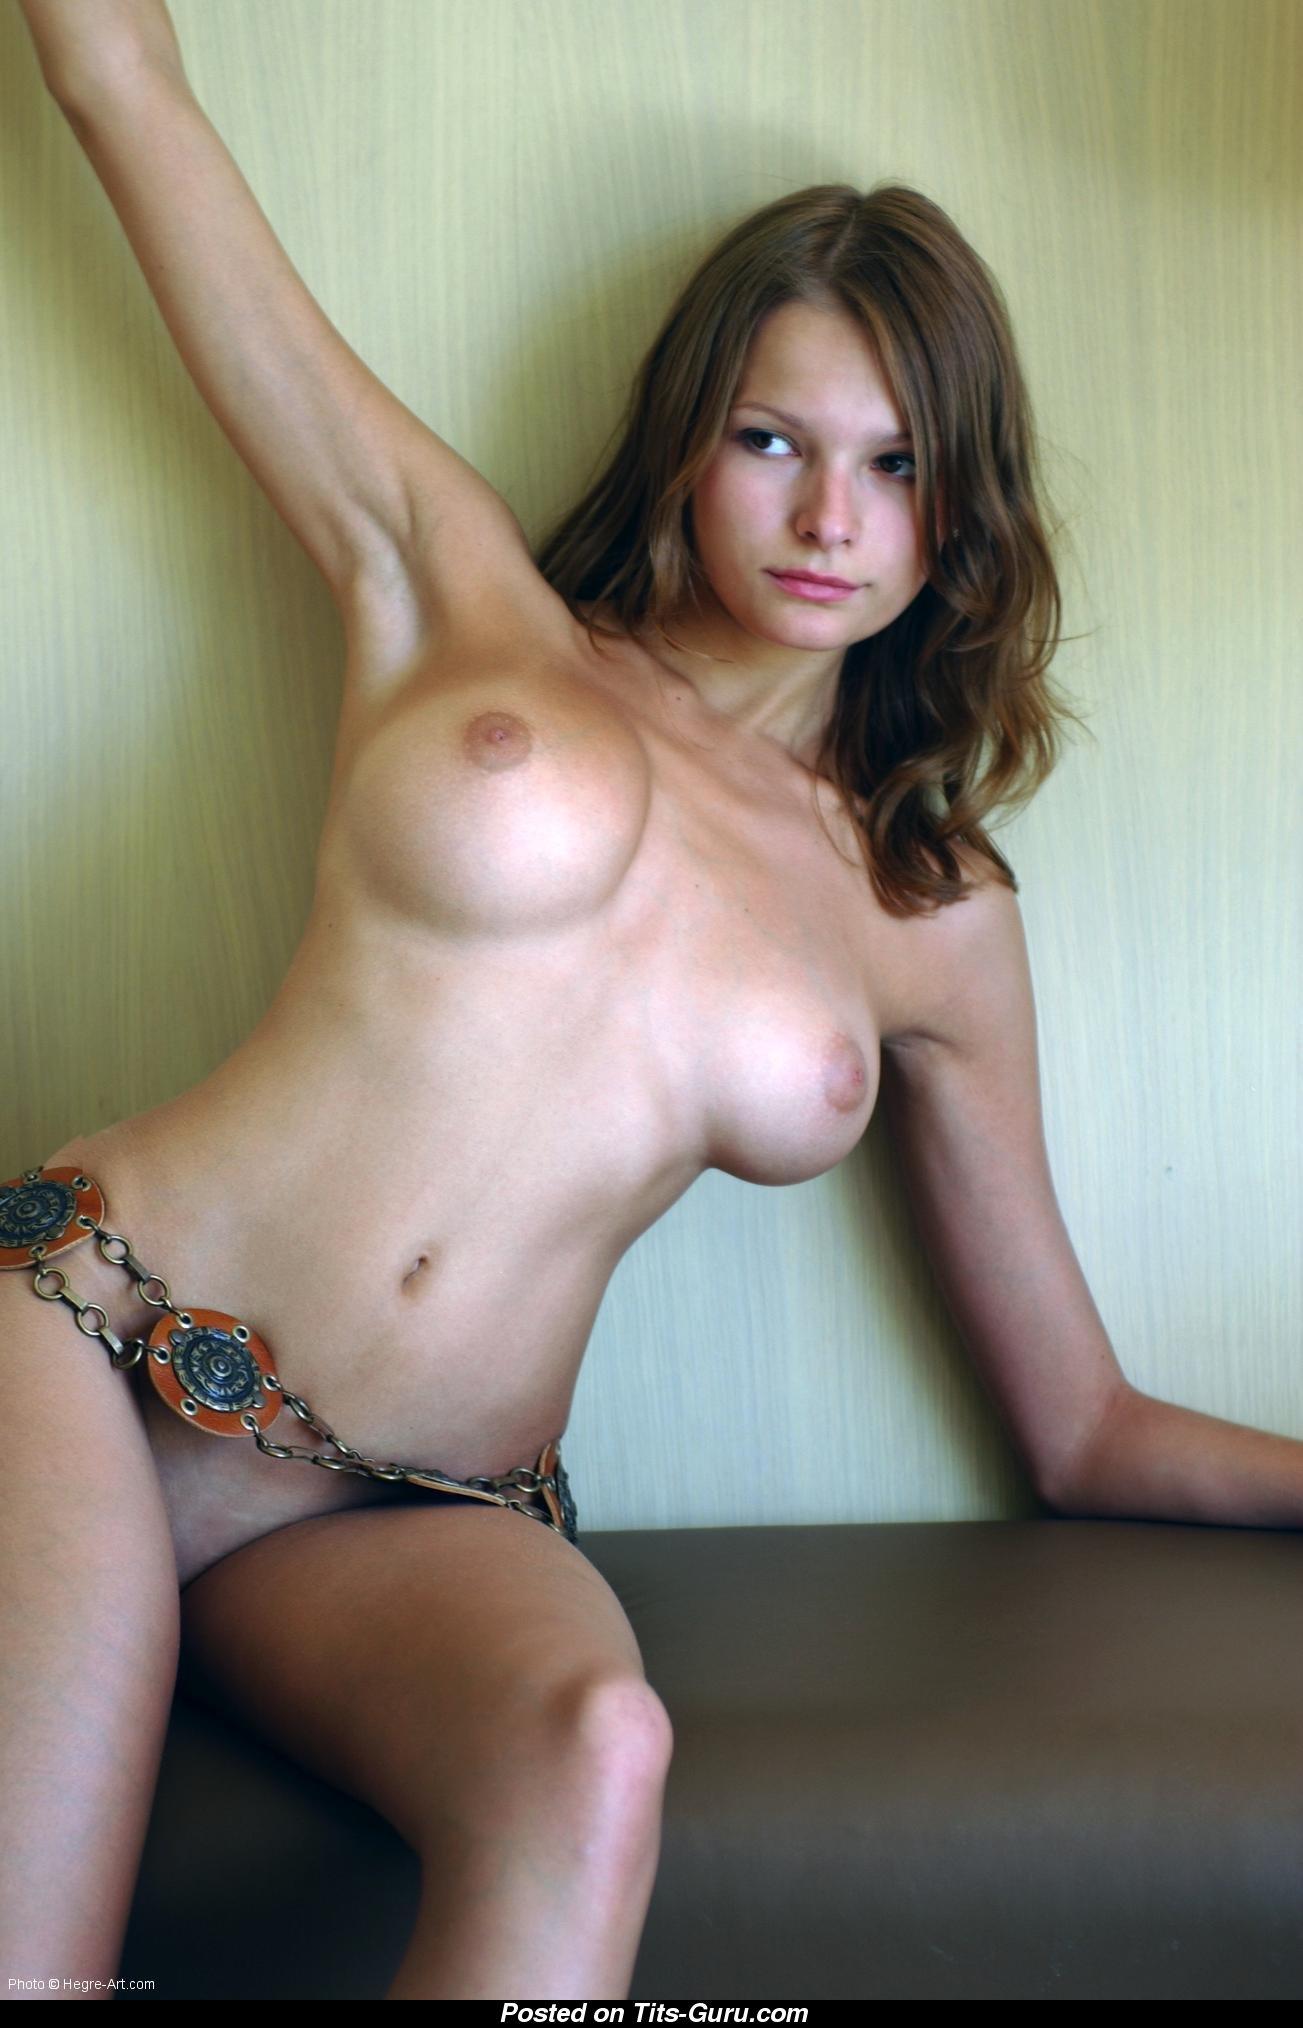 Jelena jensen boobs gif